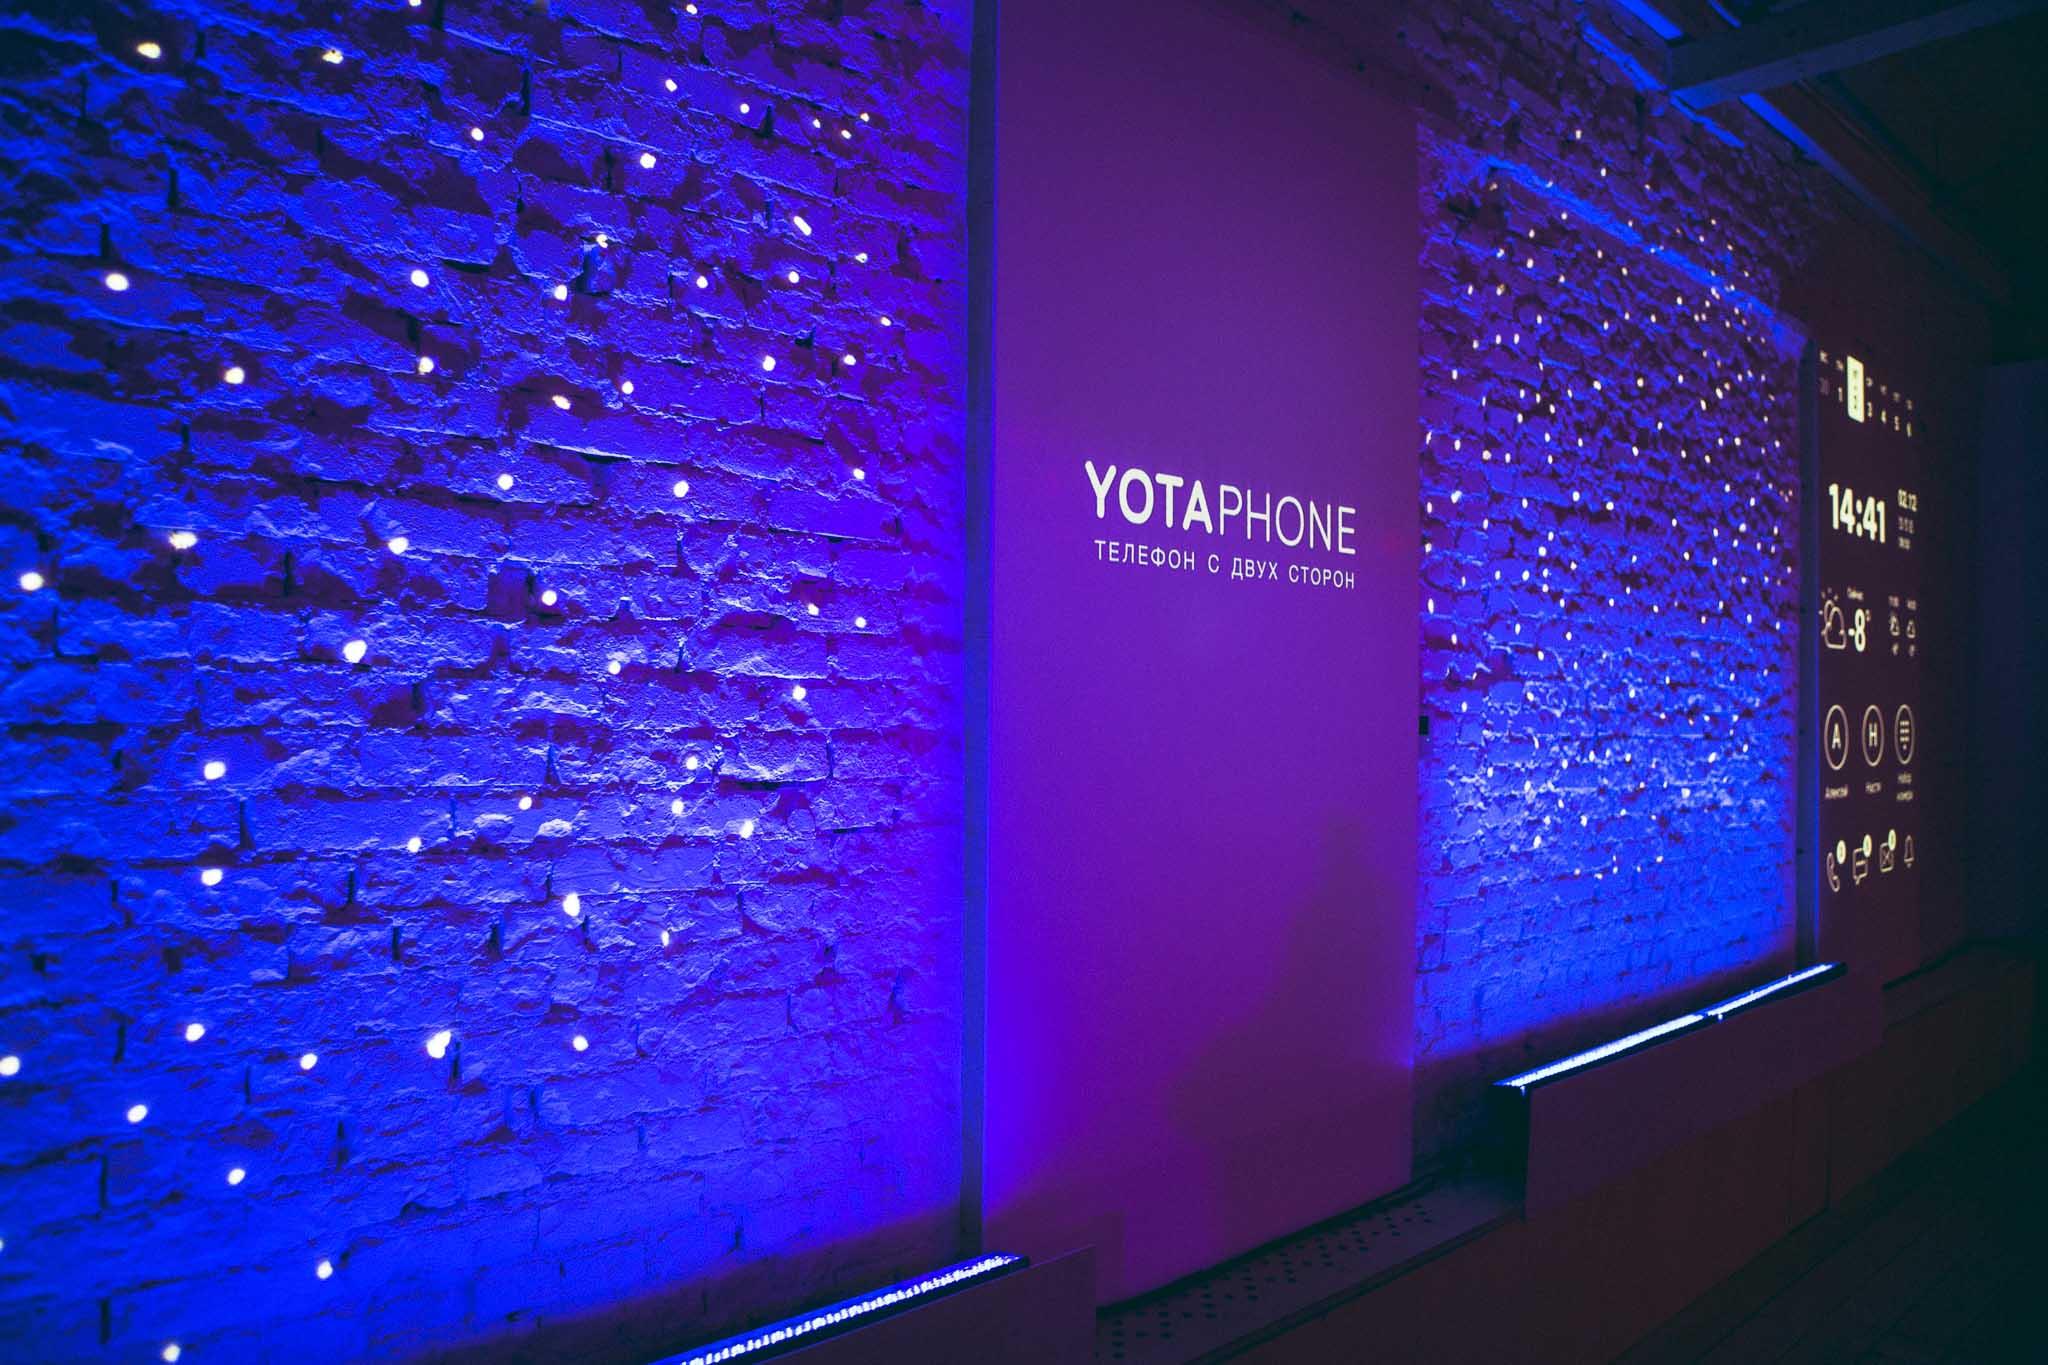 yp_20141202_153921_презентация_Event_yota_yotaphone_Urban_moscow